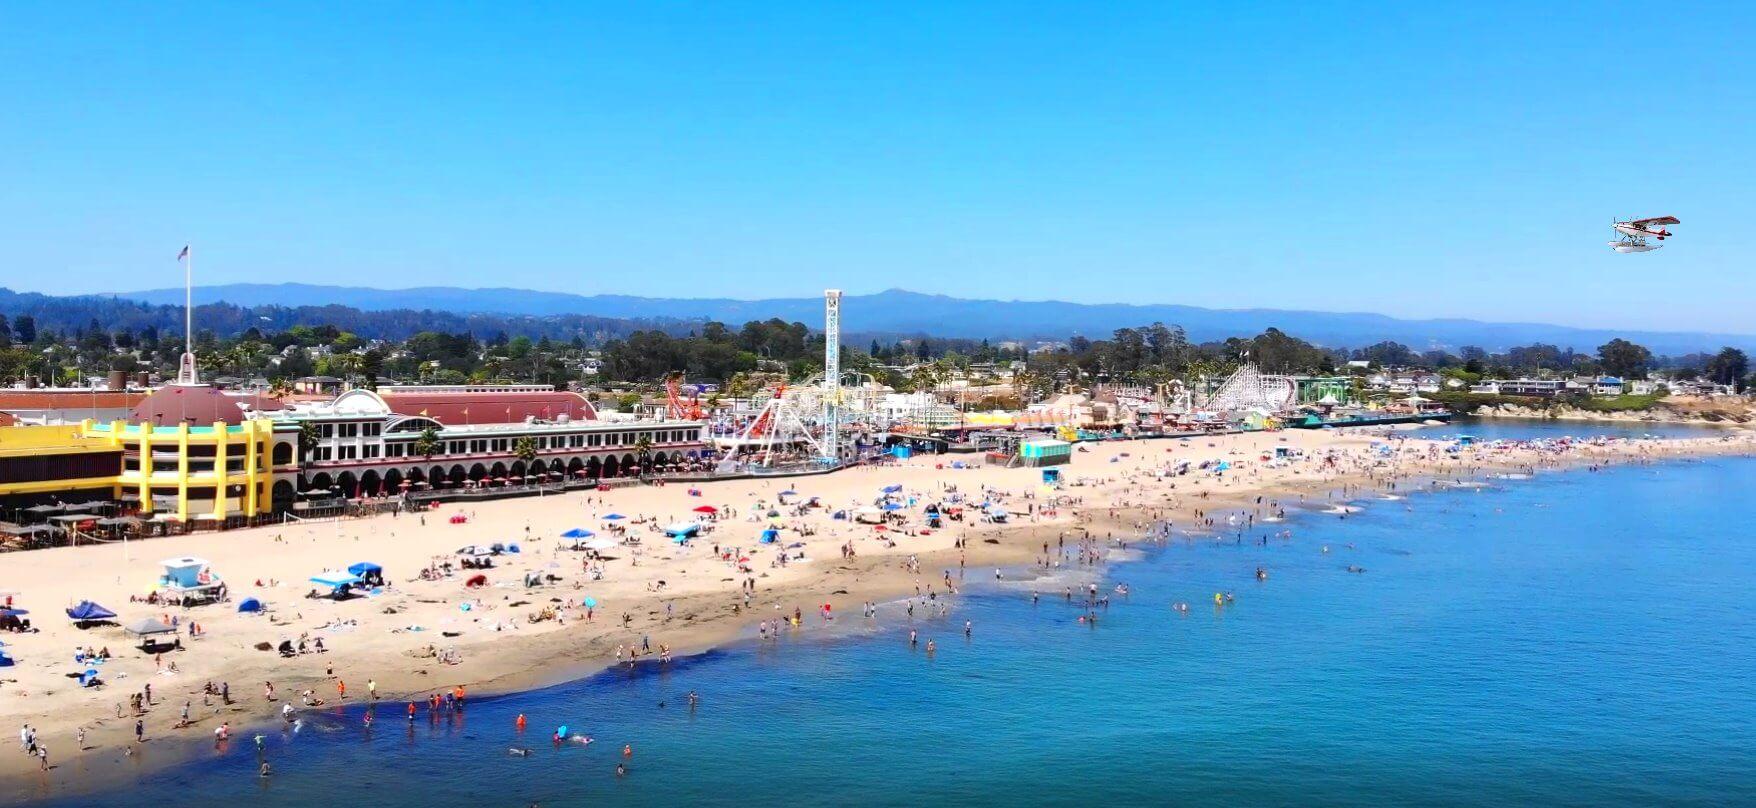 visit_the_beach_town_of_santa_cruz_attractions_and_beach_boardwalk_aerial_views